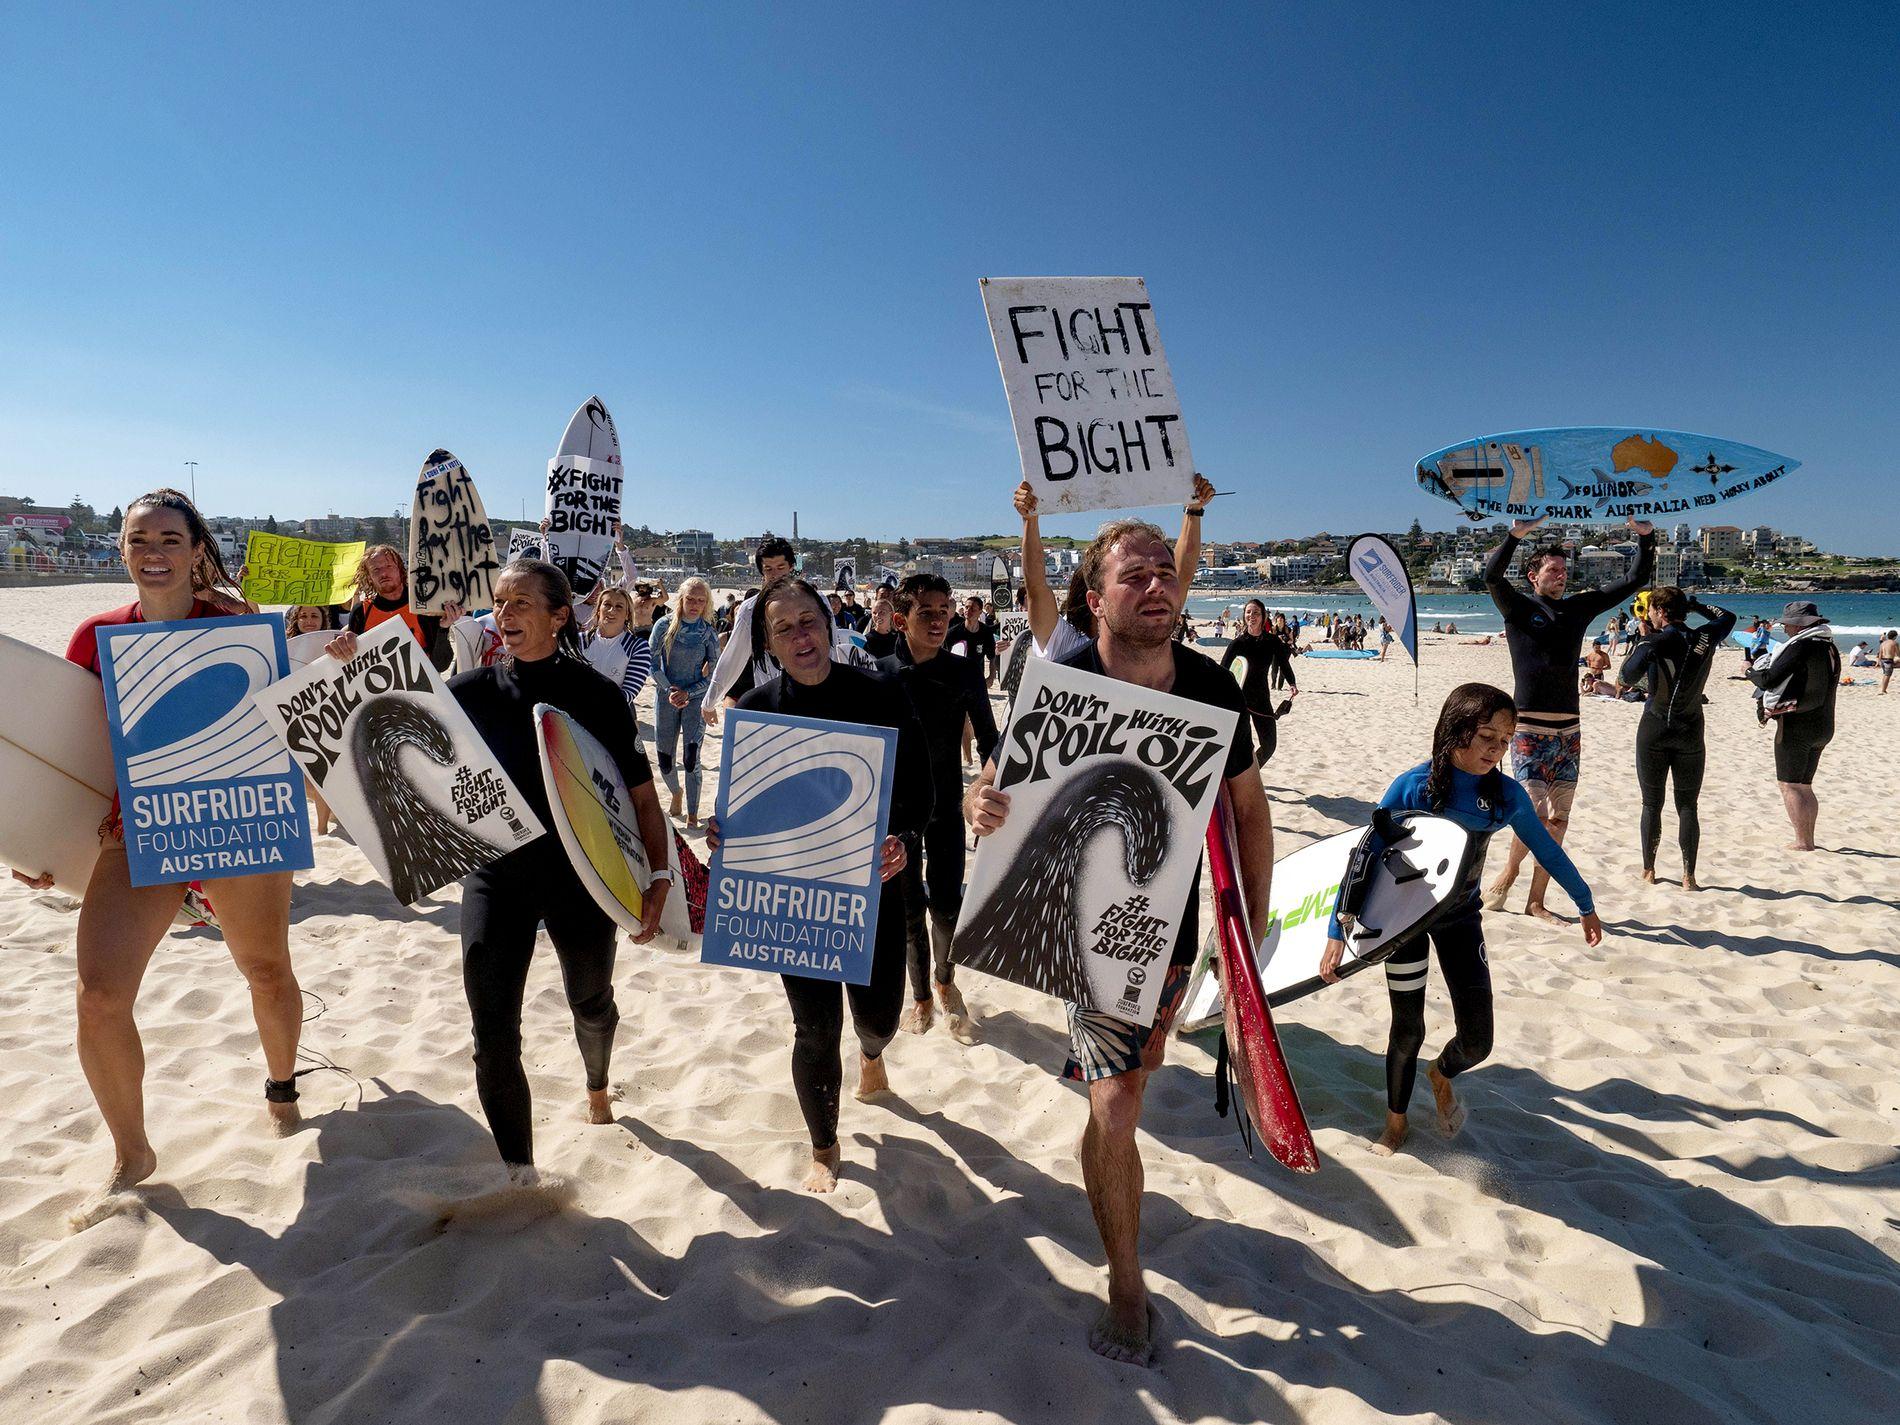 «NO WAY»: Syv ganger verdensmester i surfing Layne Beachley (nr. to fra venstre), Susie Crick i Surfrider Foundation og ambassadør Damien Cole demonstrerer mot Equinor på Bondi Beach i Sydney.